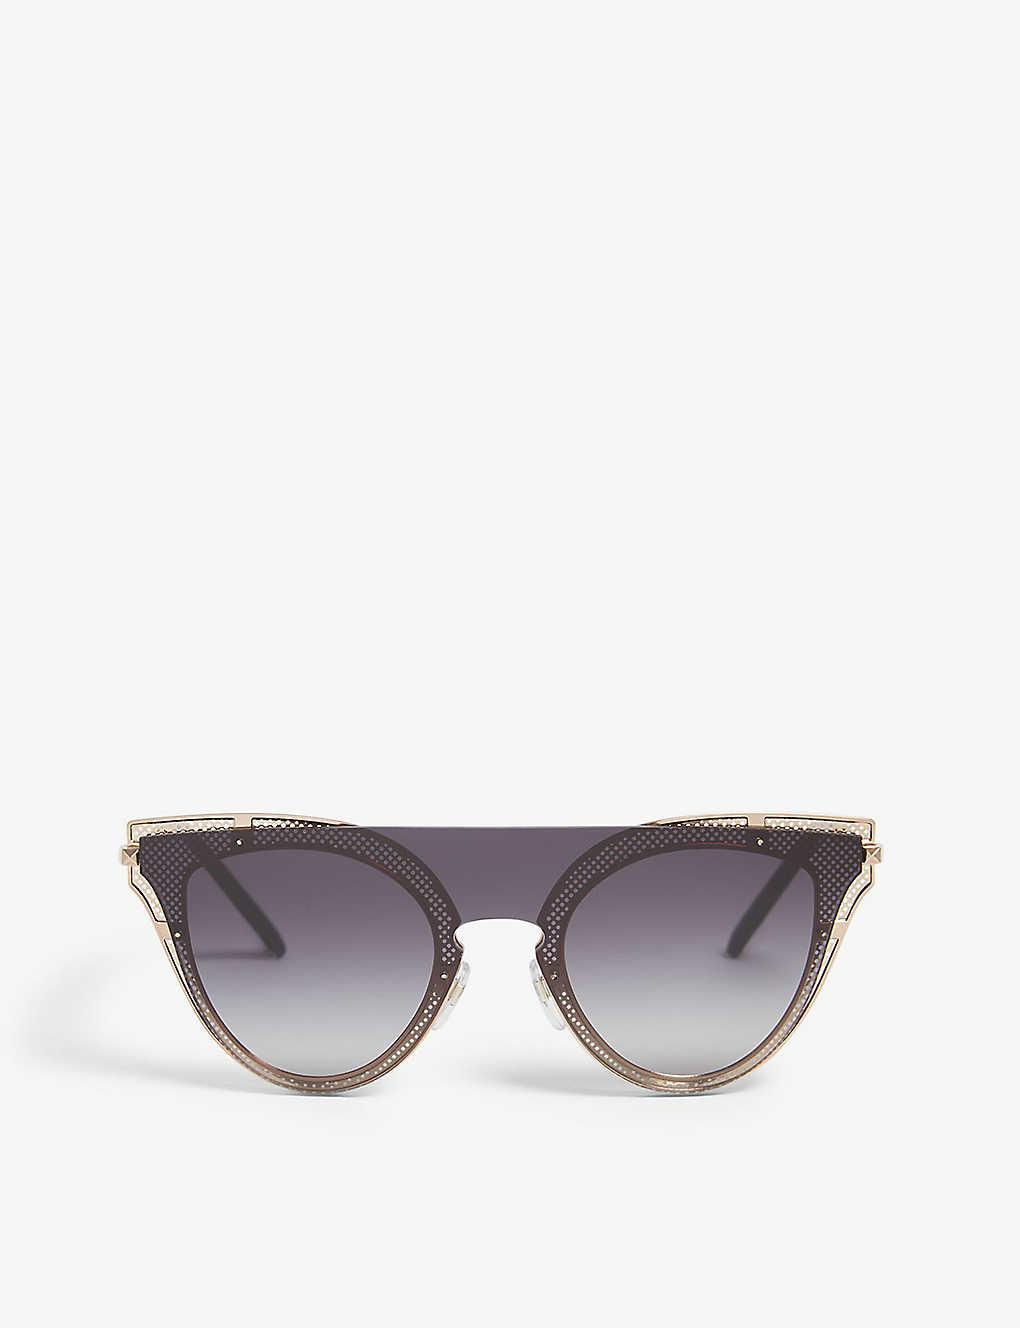 5151337af78b4 VALENTINO - Va2020 cat-eye sunglasses